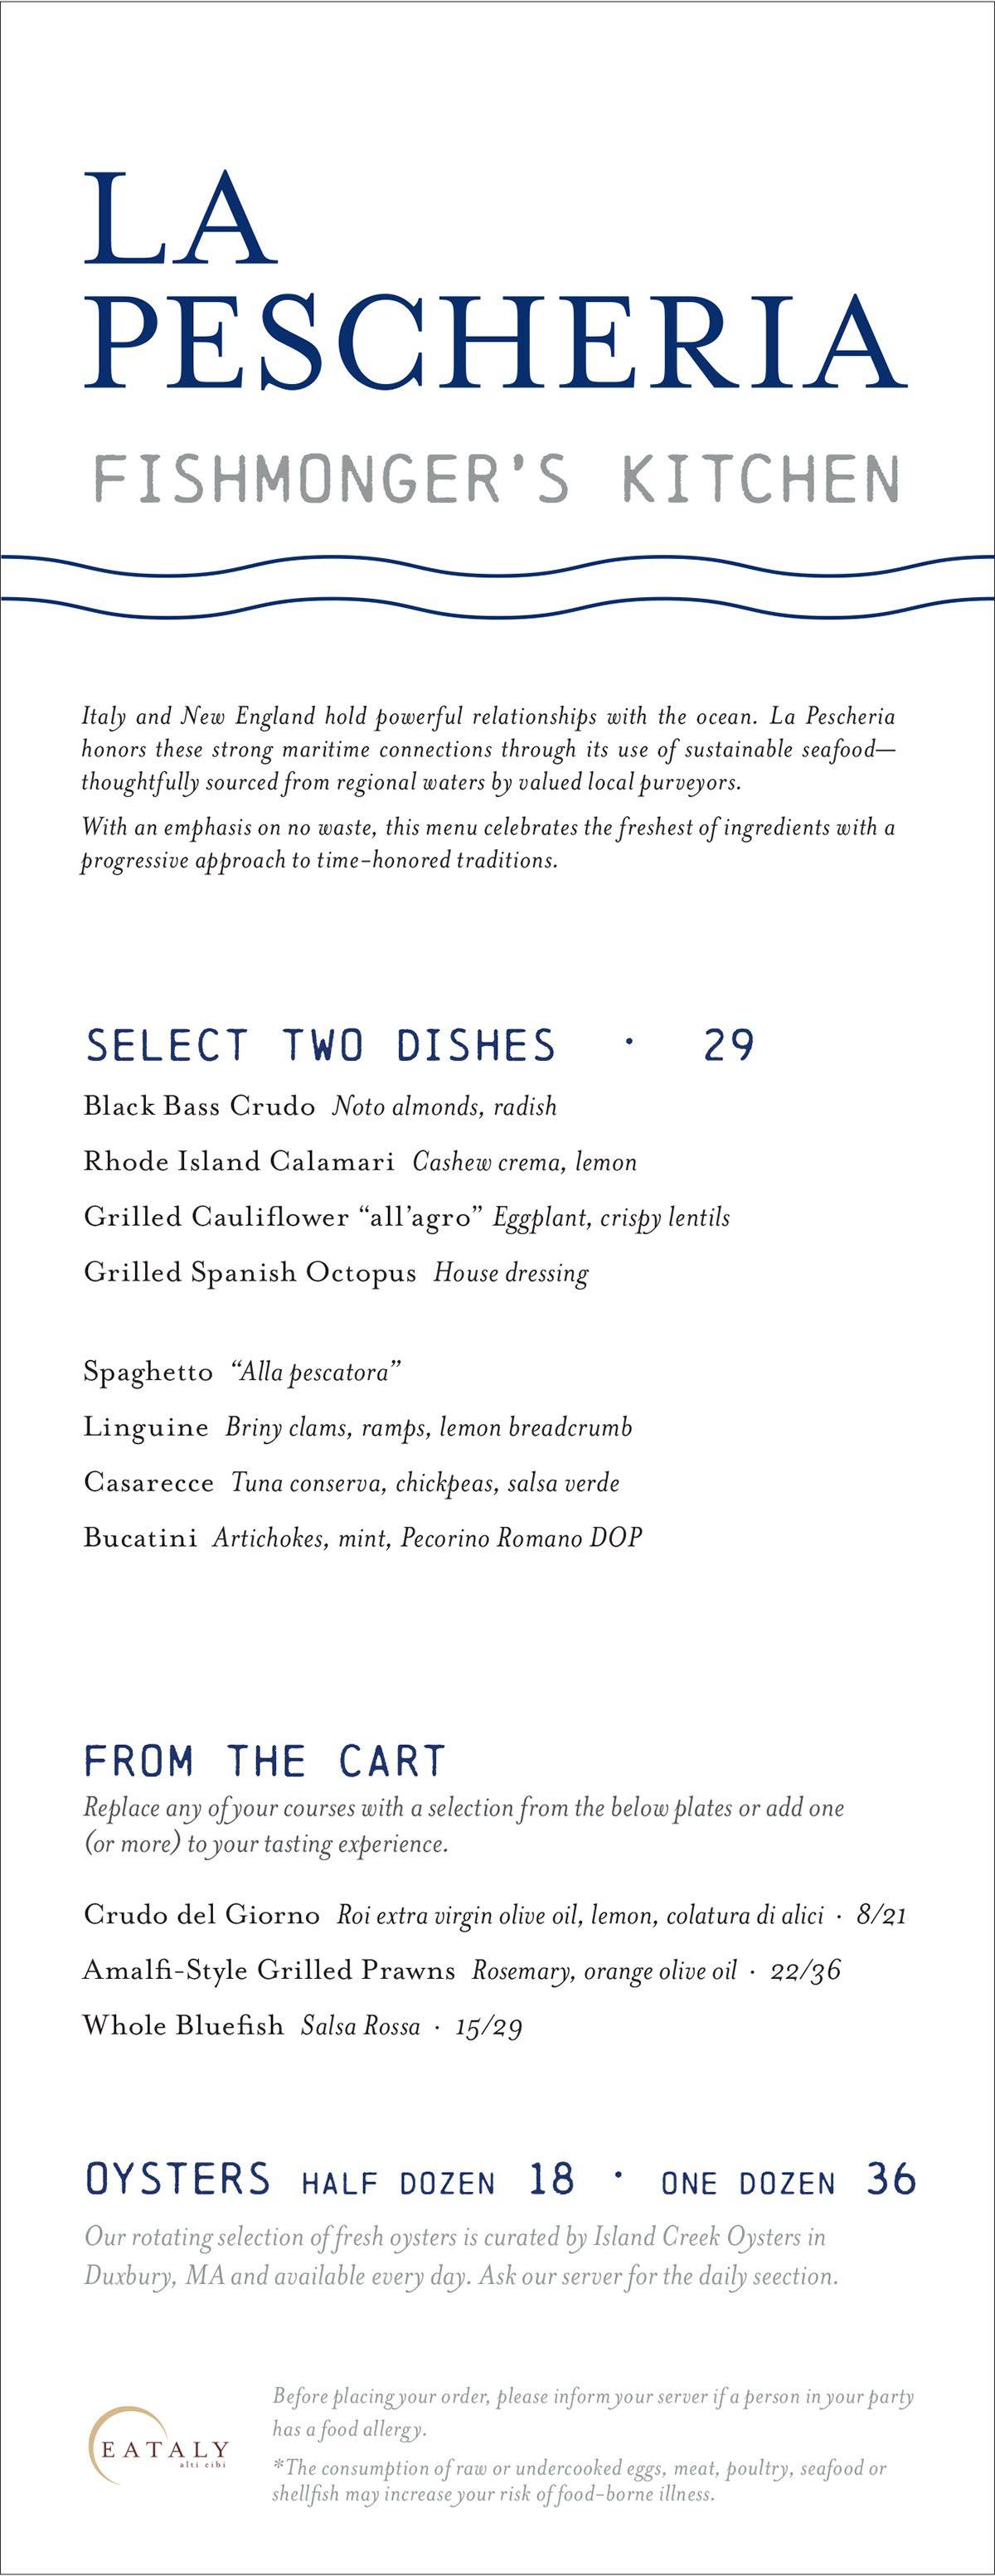 La Pescheria lunch menu at Eataly Boston